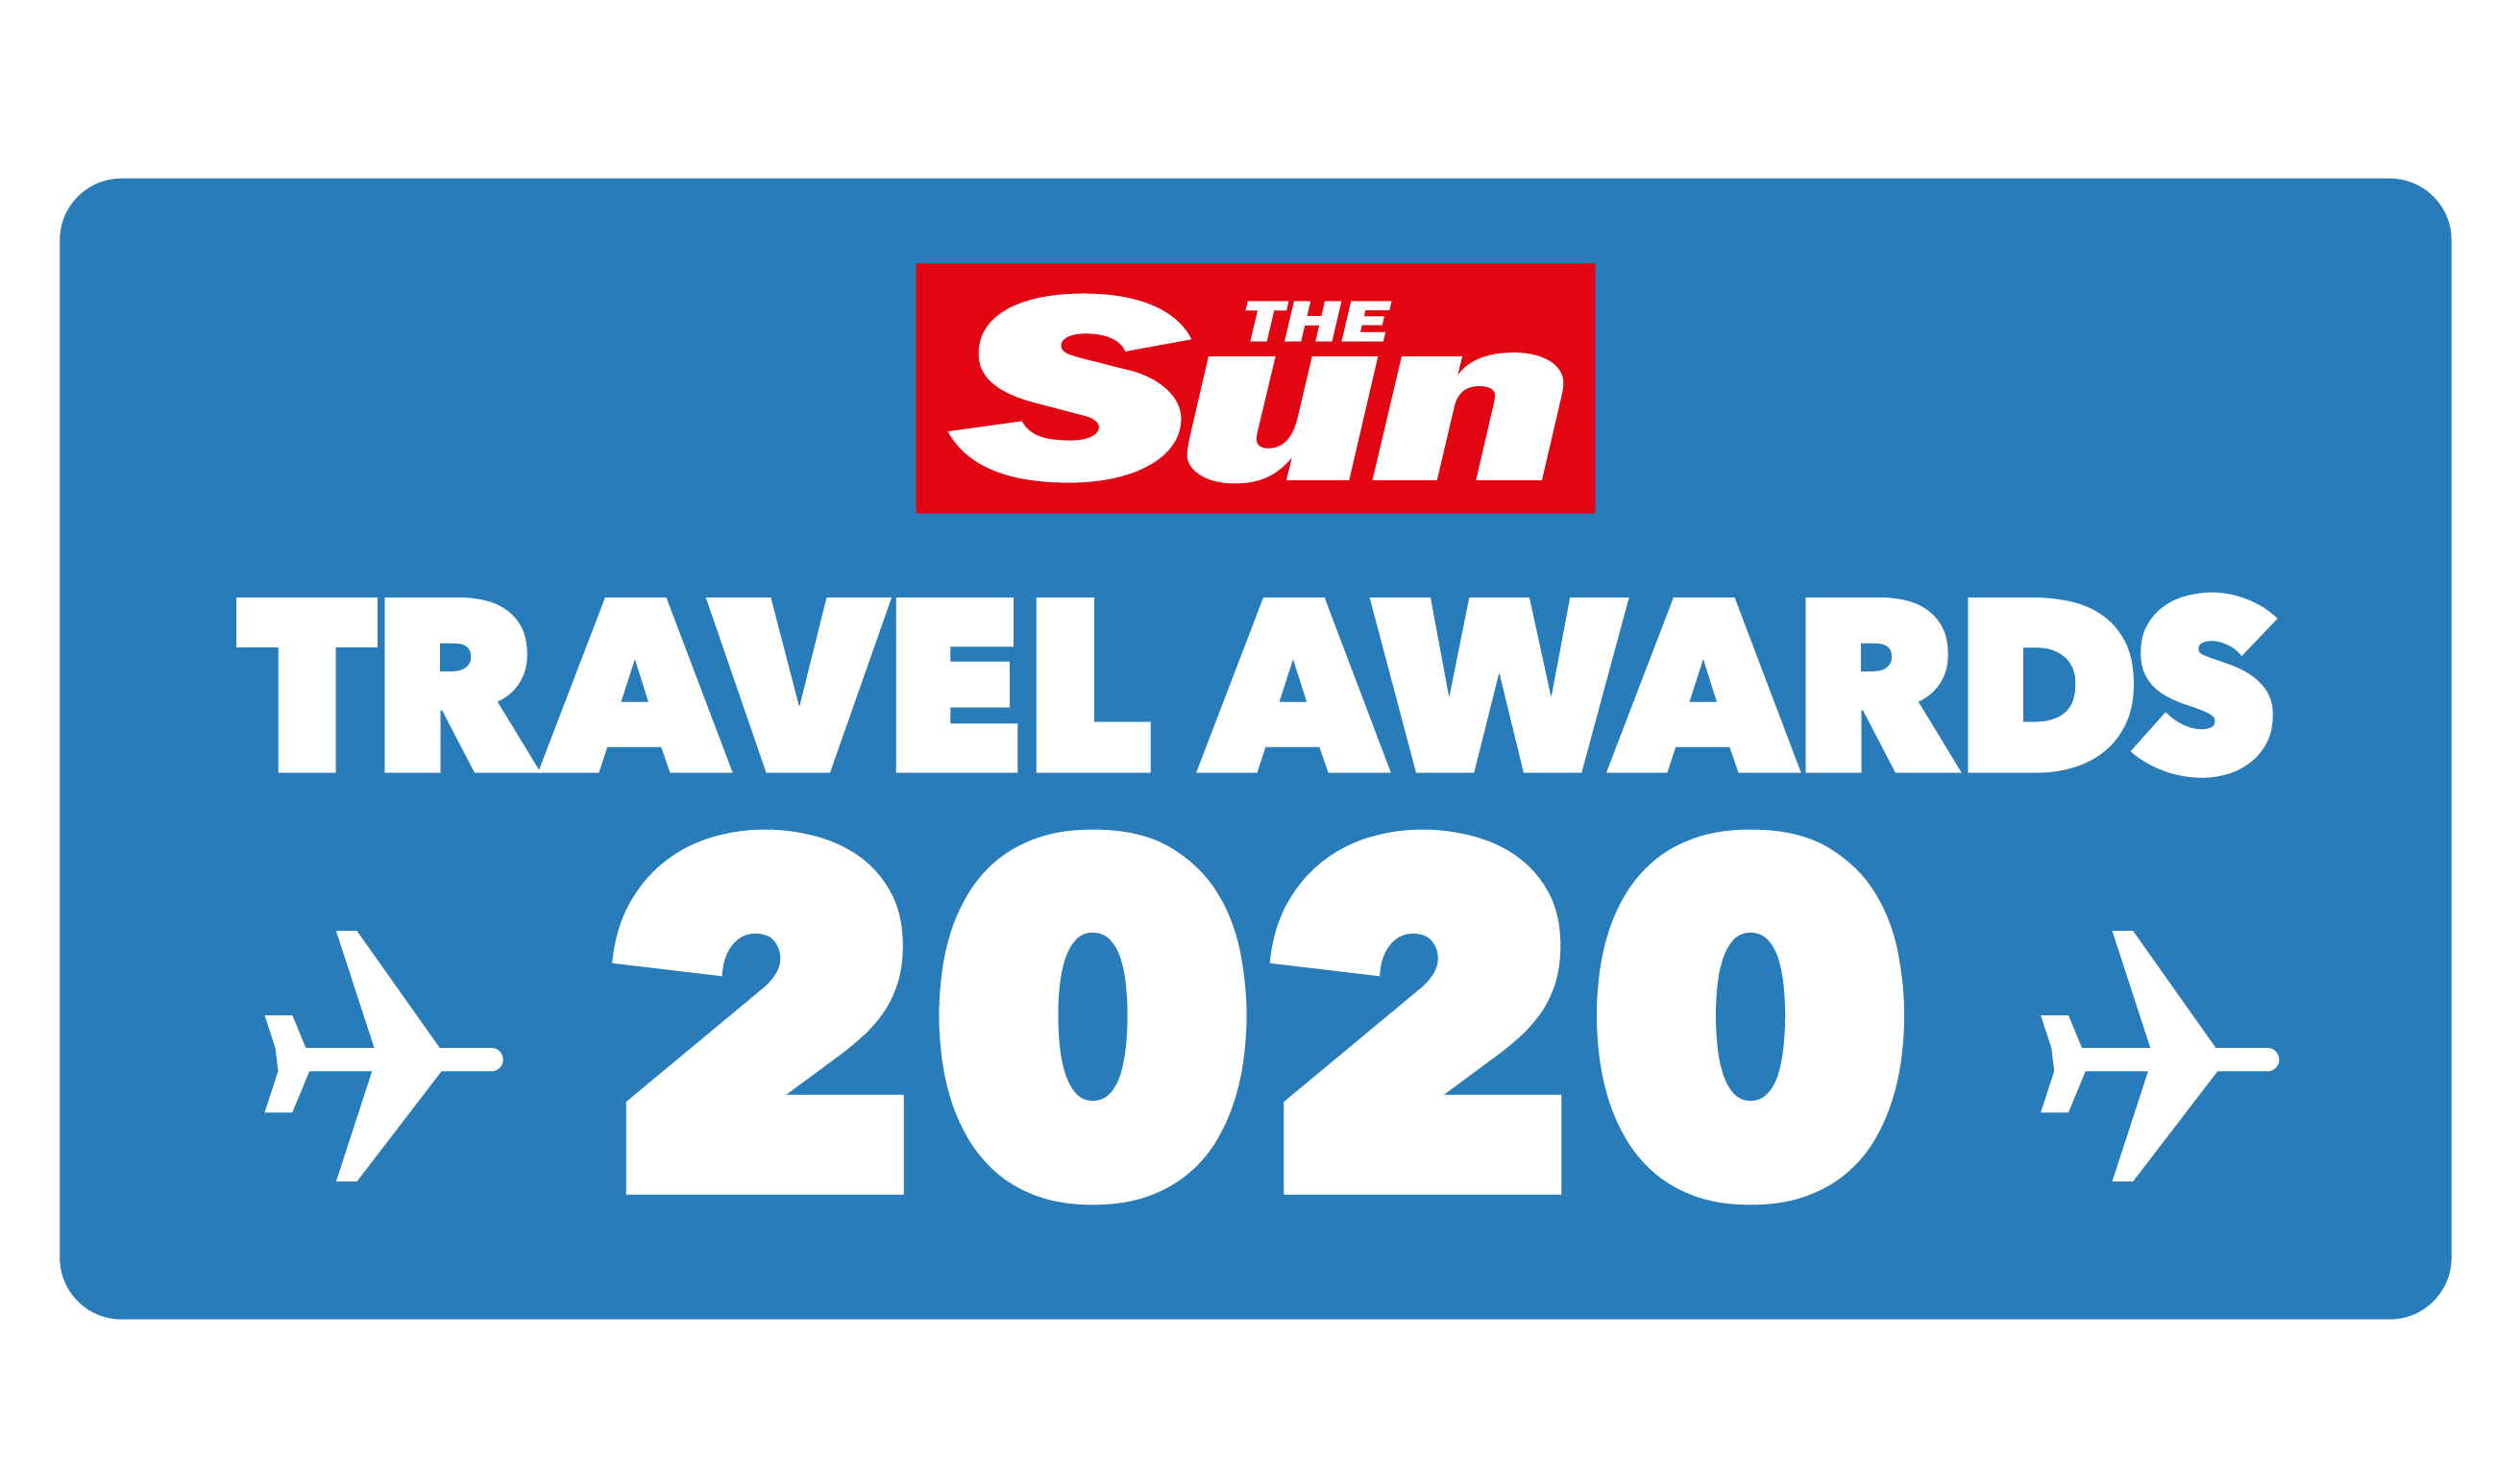 The Sun Travel Awards - Winners